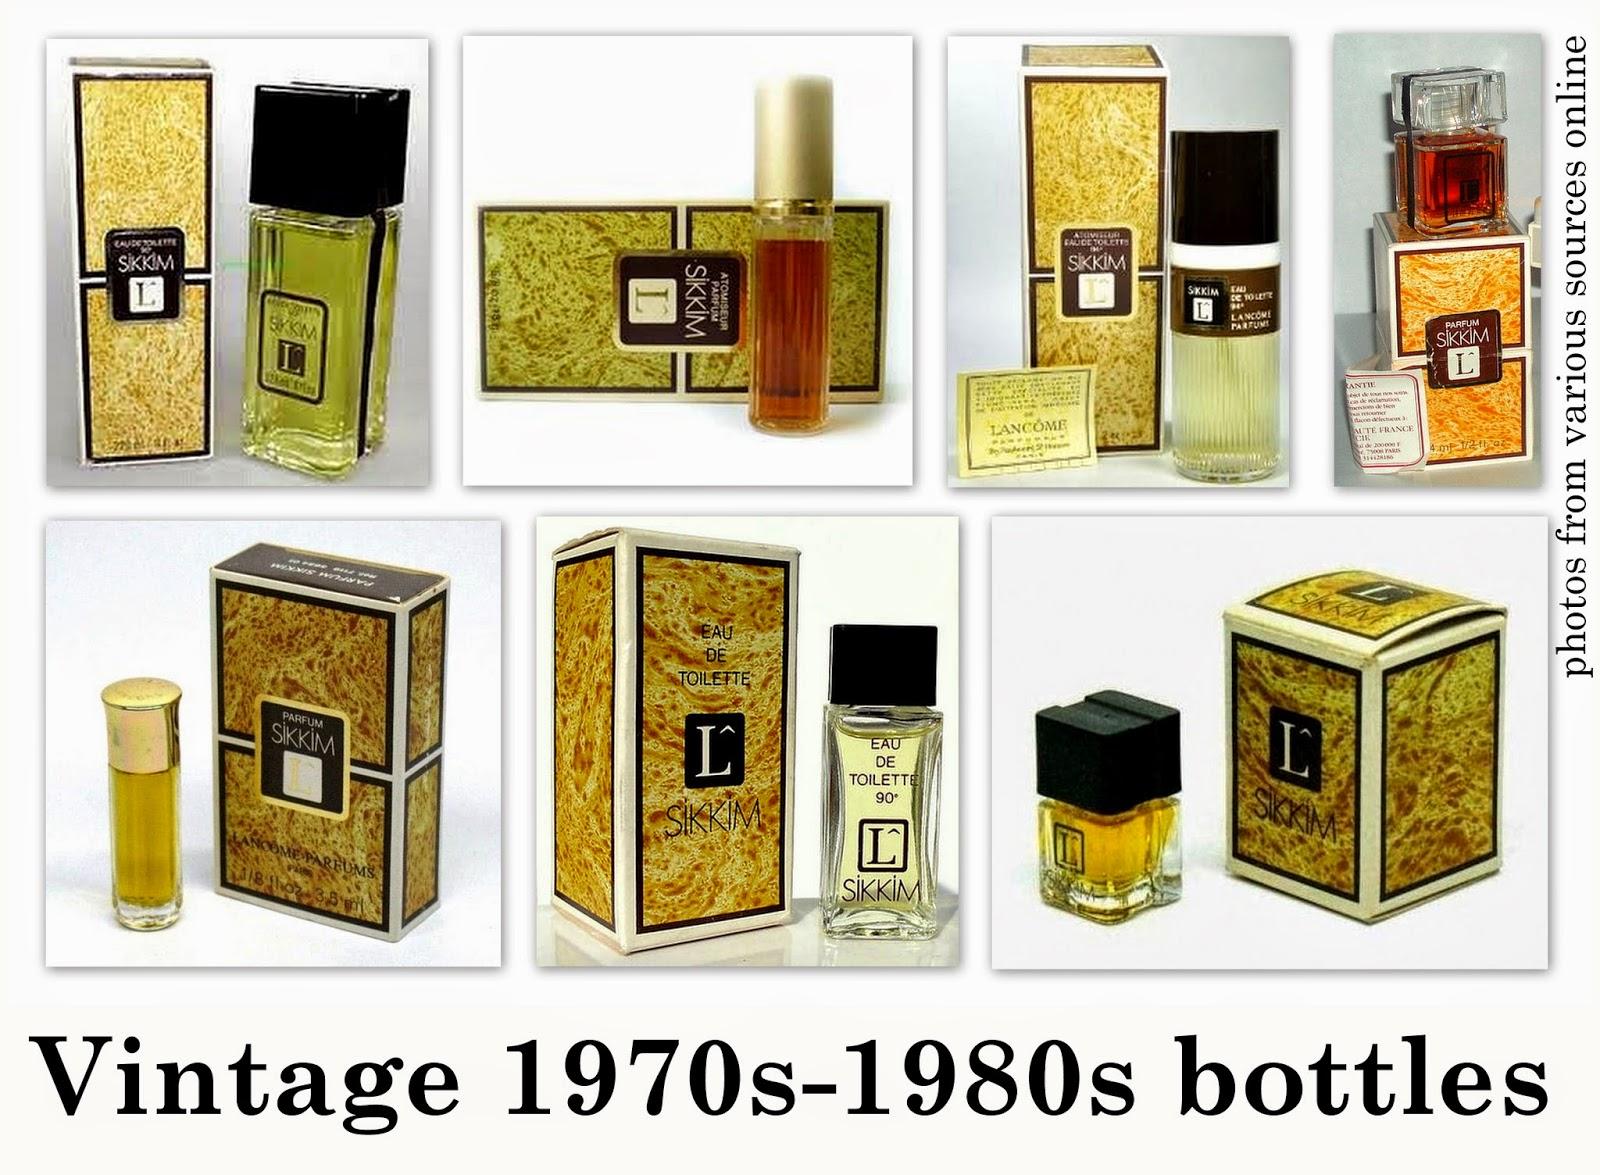 c8b31b5dd Parfums Lancome: Sikkim c1971